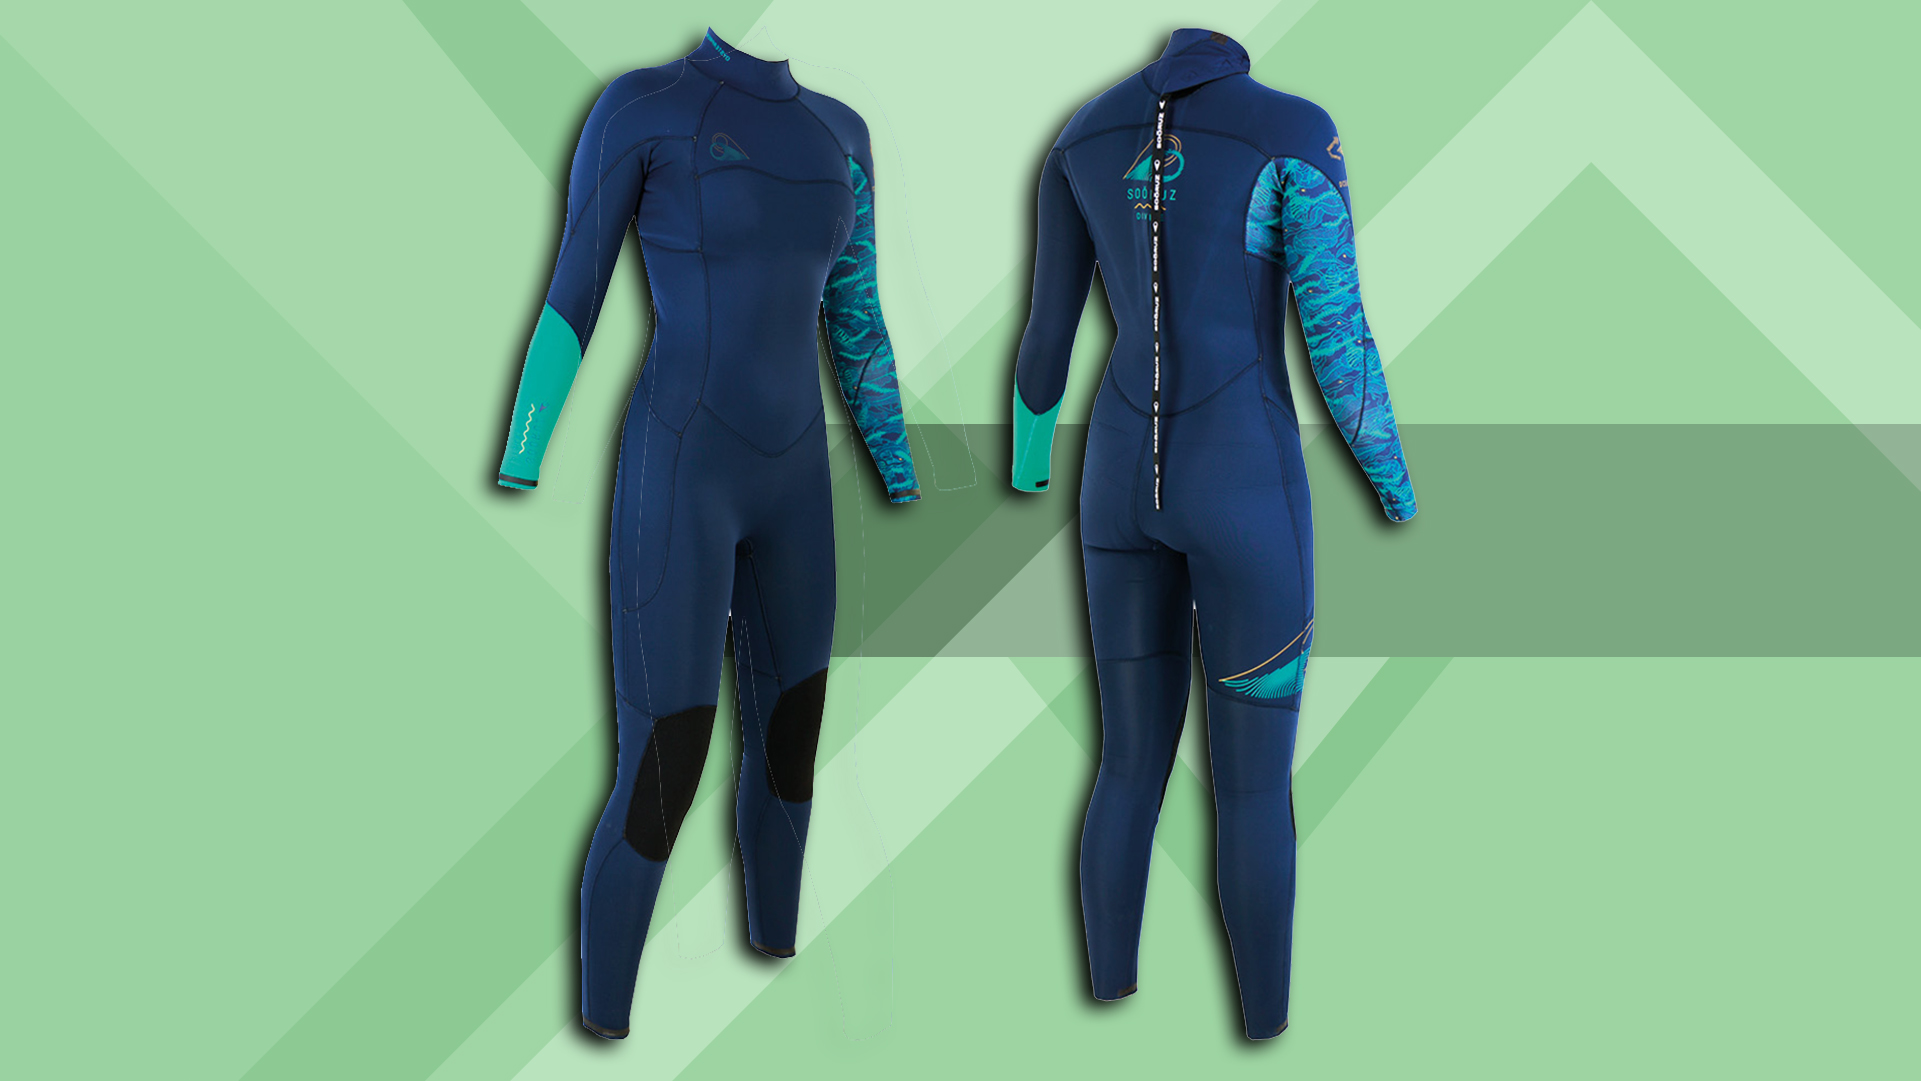 Soöruz Divine Fullsuit Damen Wetsuit 2021